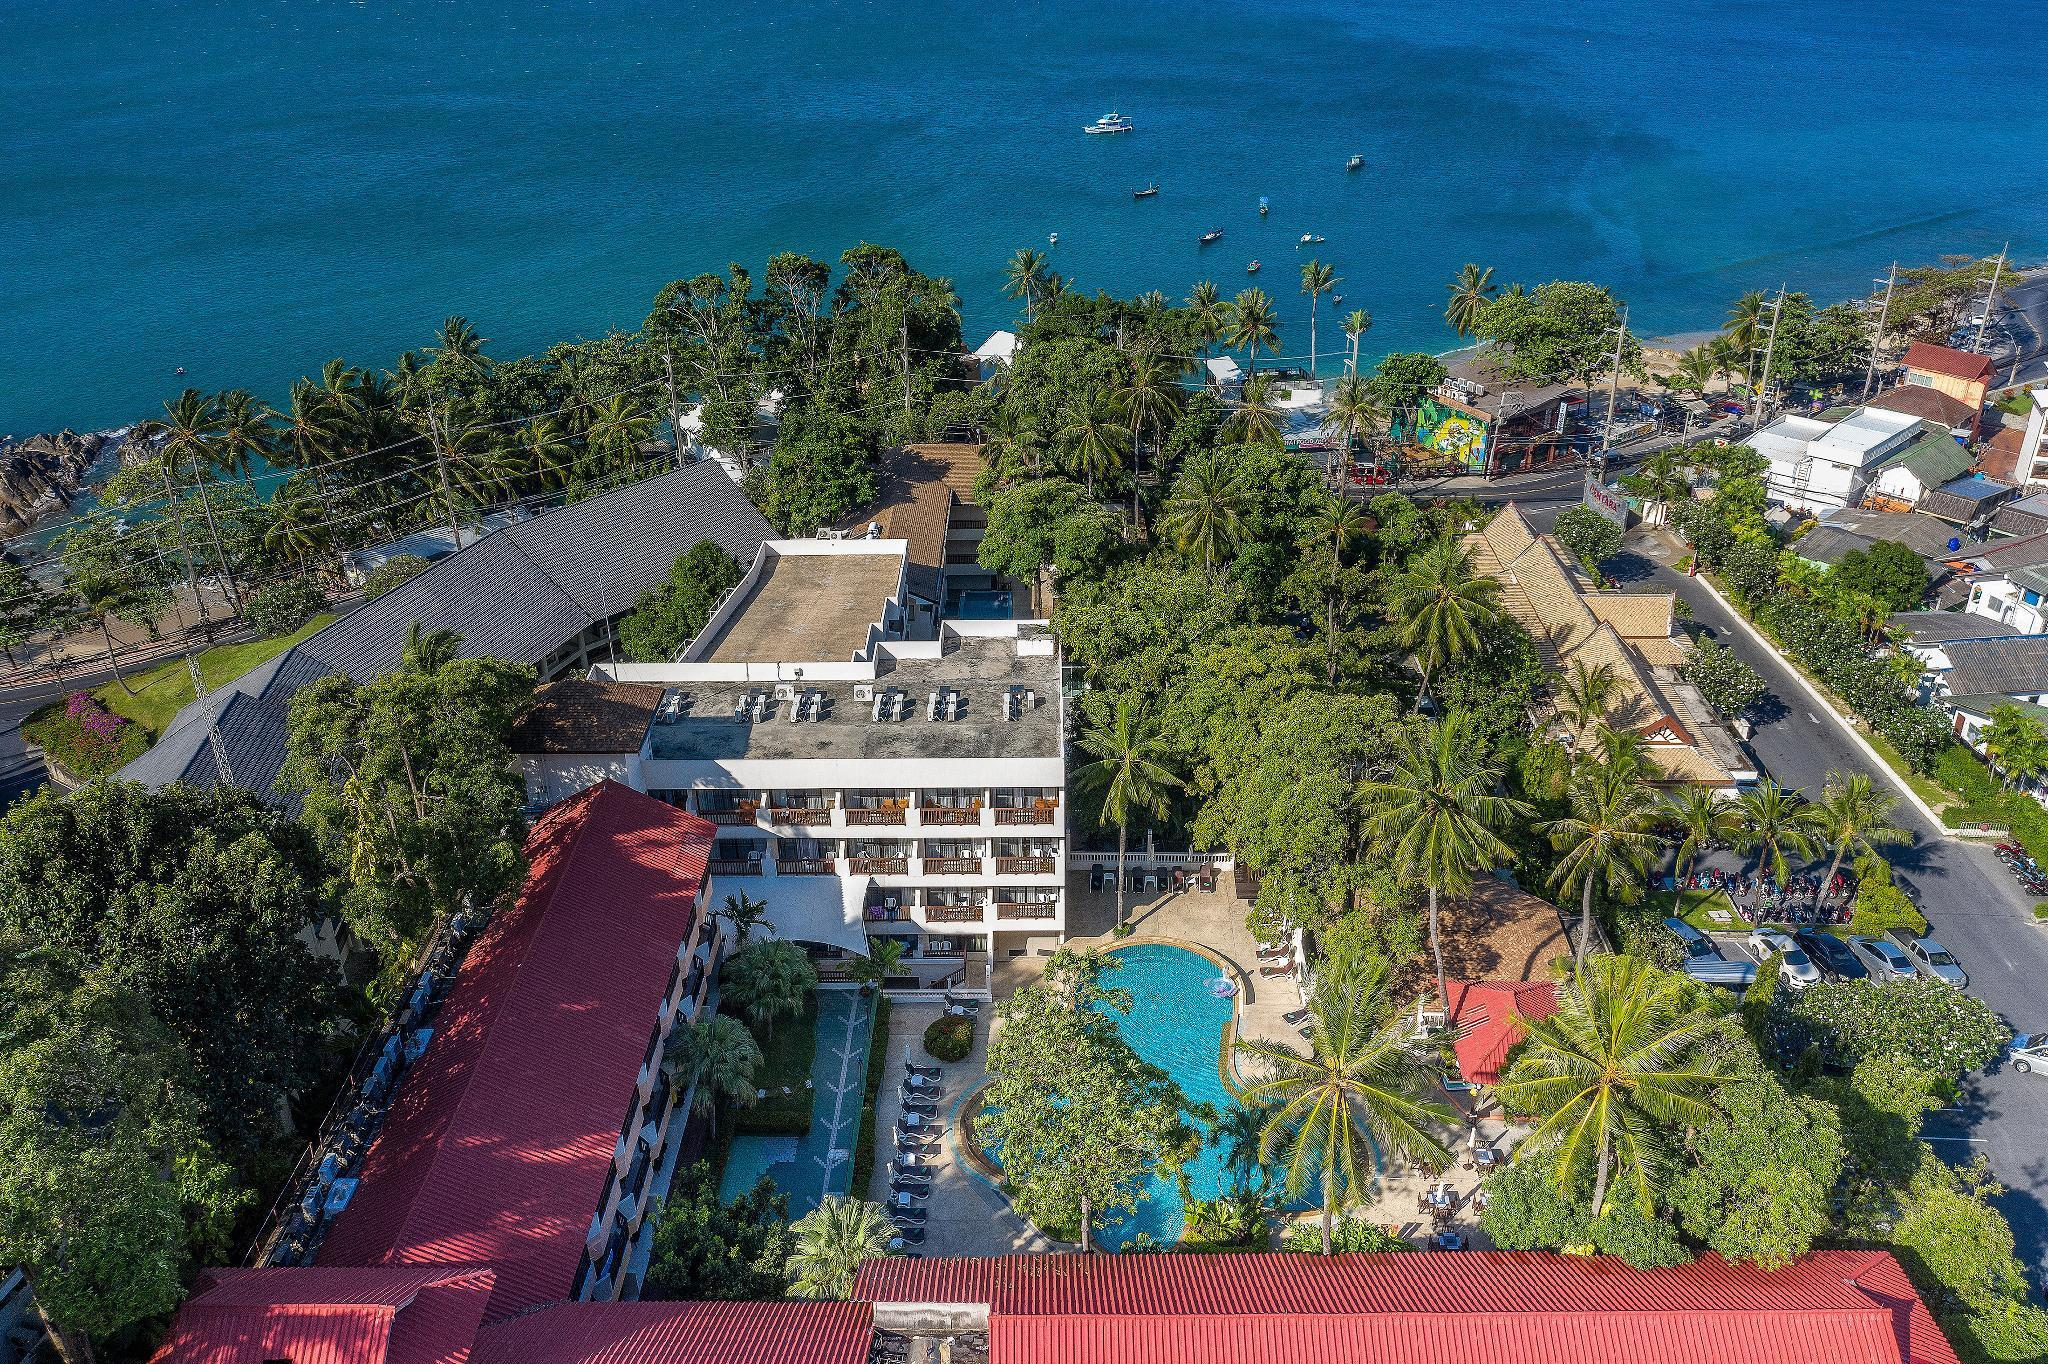 Patong Lodge Hotel ป่าตอง ลอดจ์